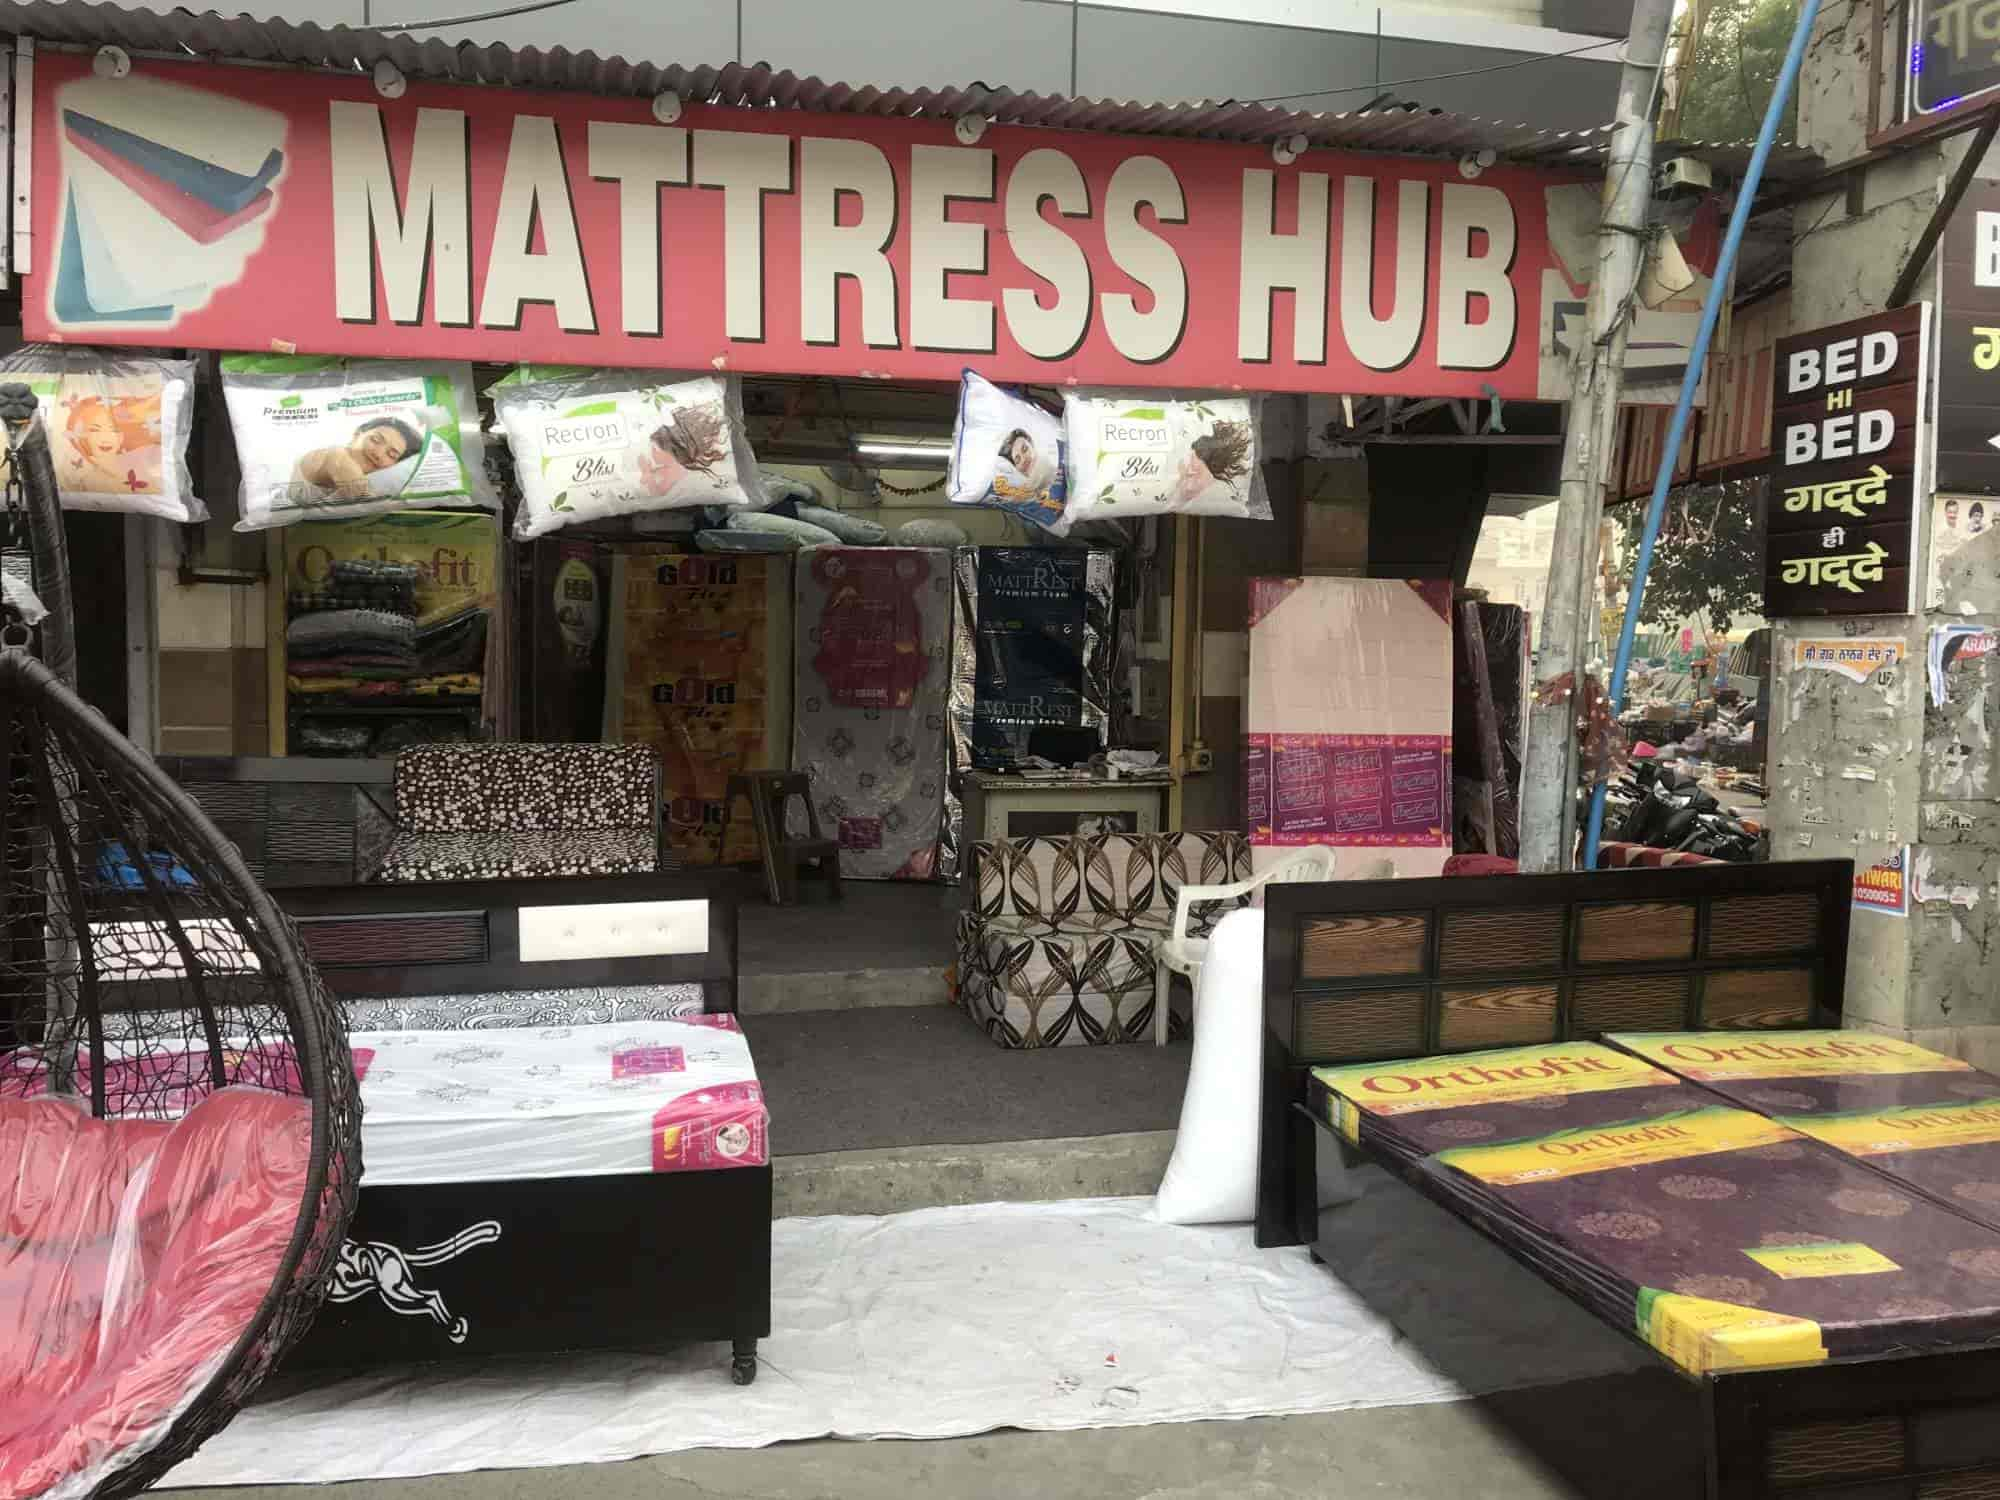 Mattress Hub Hari Nagar Furniture Dealers in Delhi Justdial